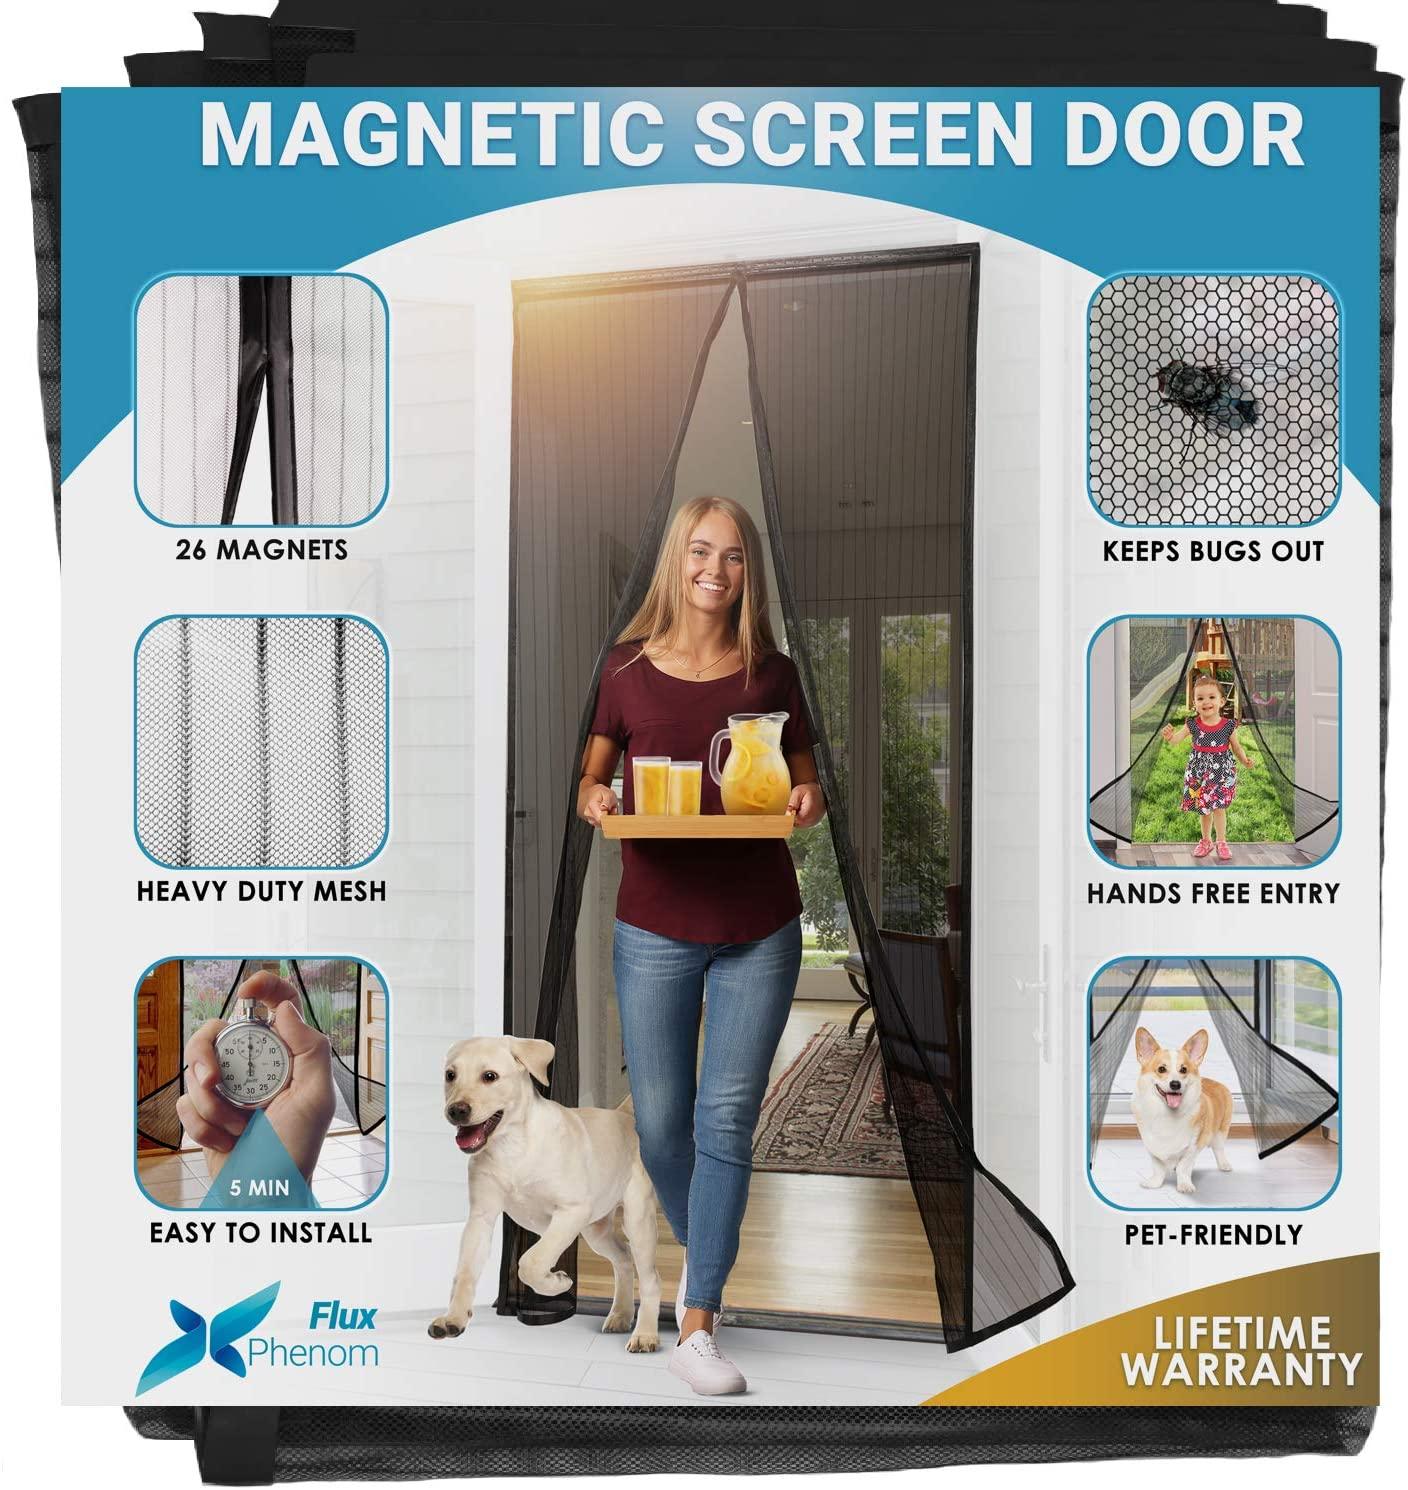 Top 7 Best Magnetic Screen Doors of 2021 – Reviews